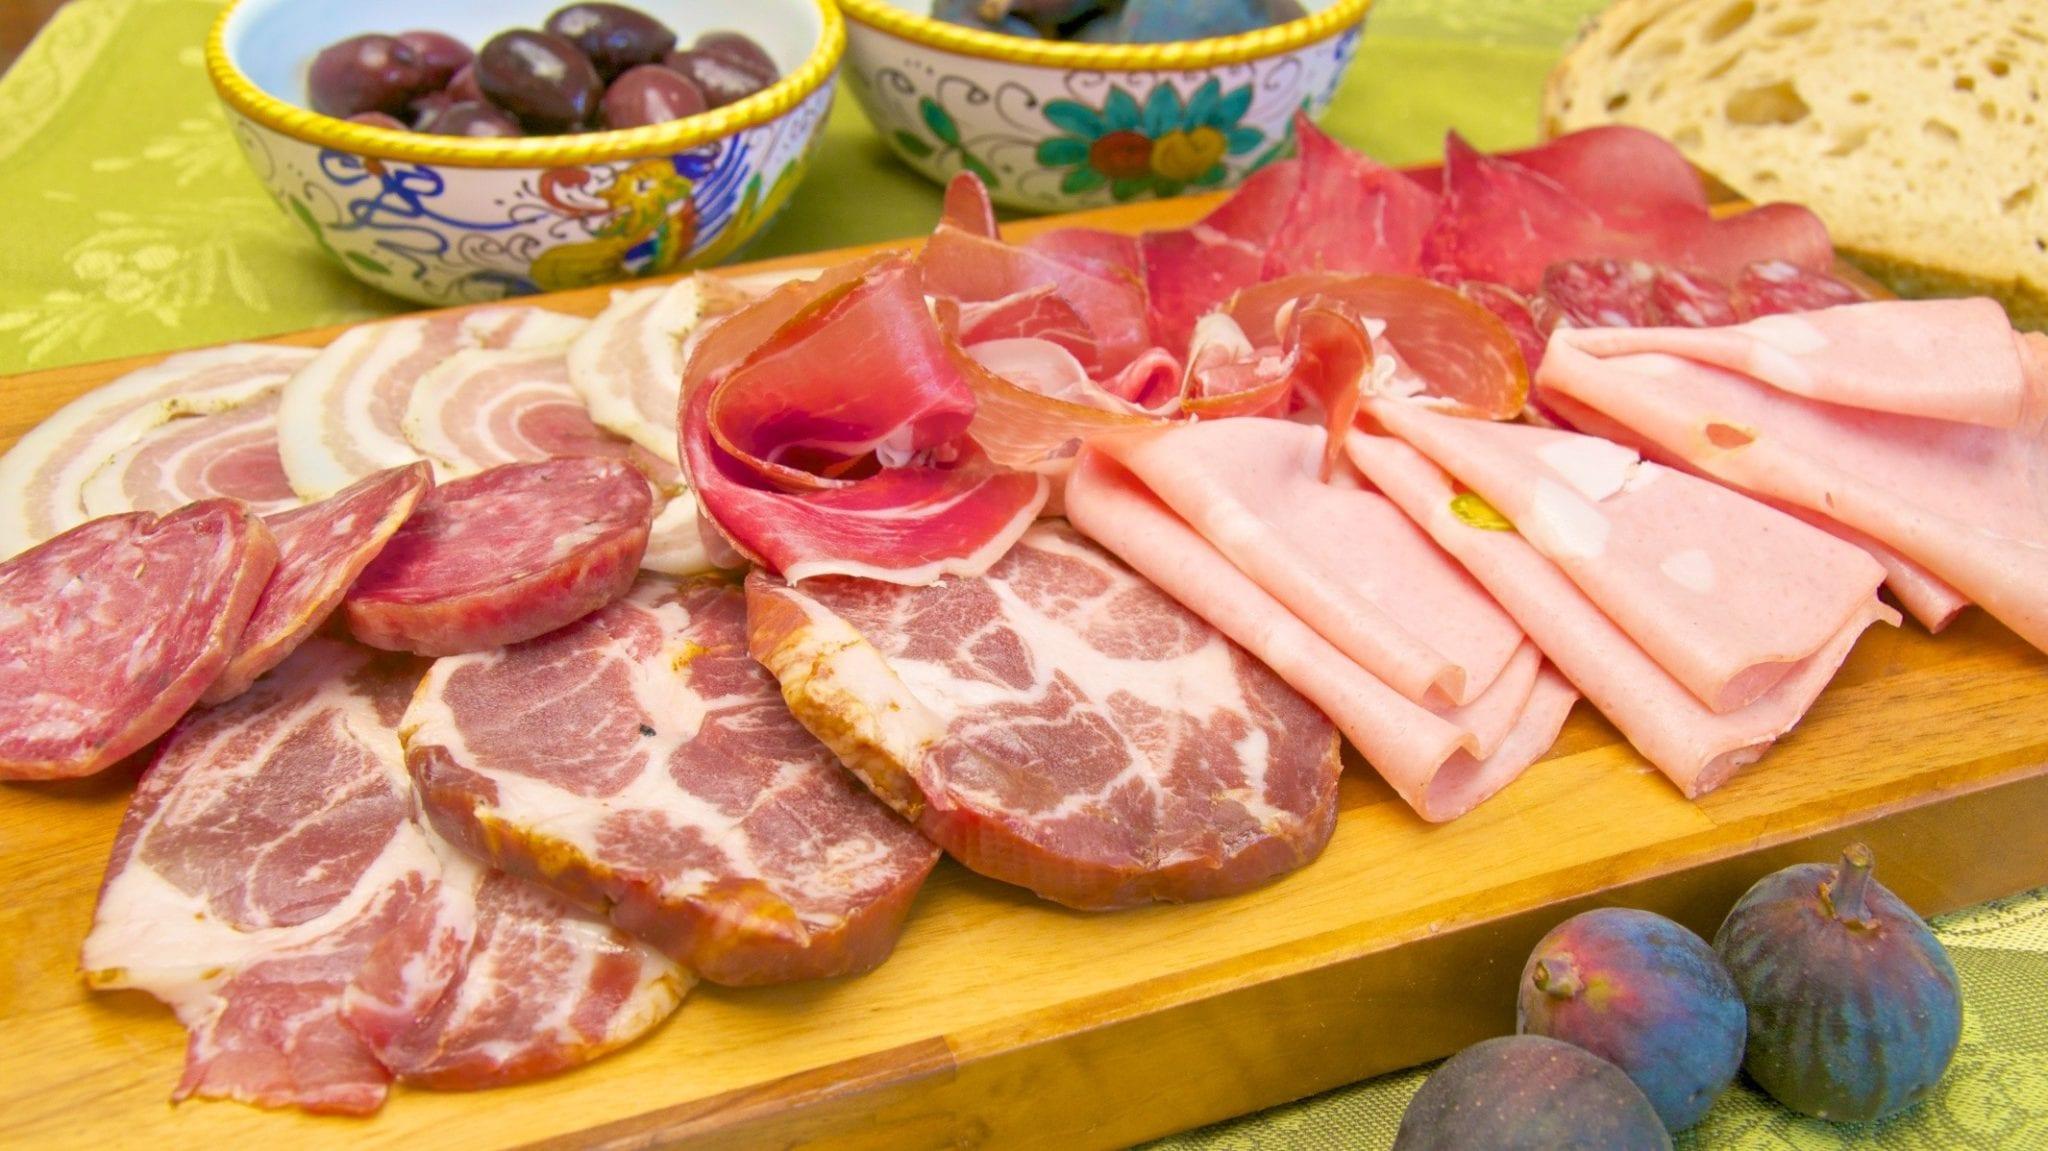 Cured meat platter